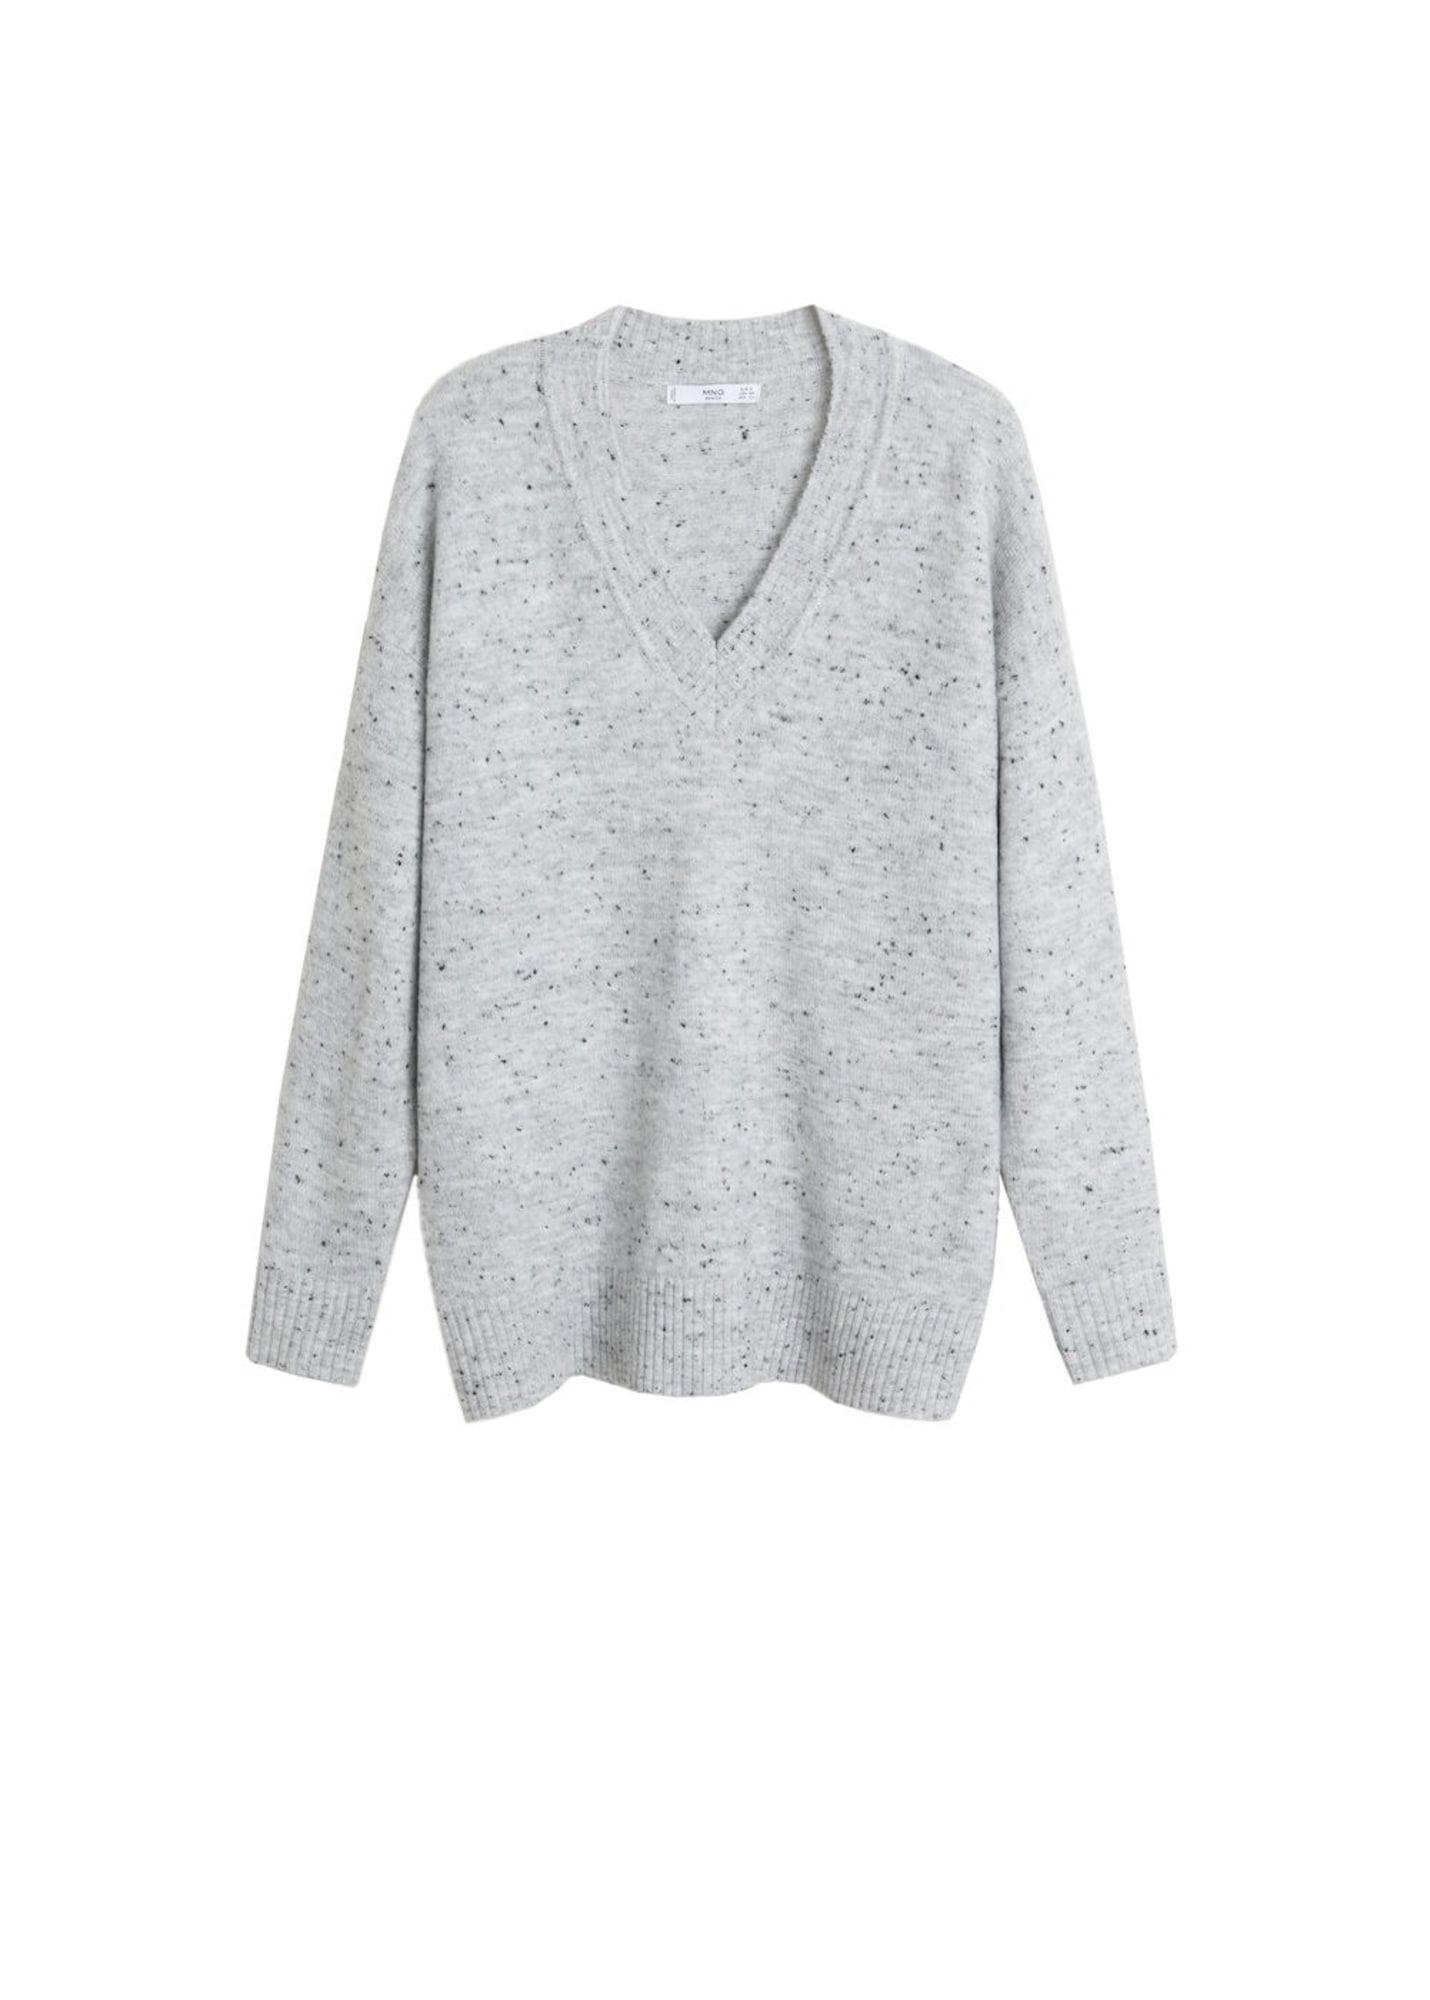 Damen Mango Pullover 'Confeti' grau, schwarz | 08445035591116